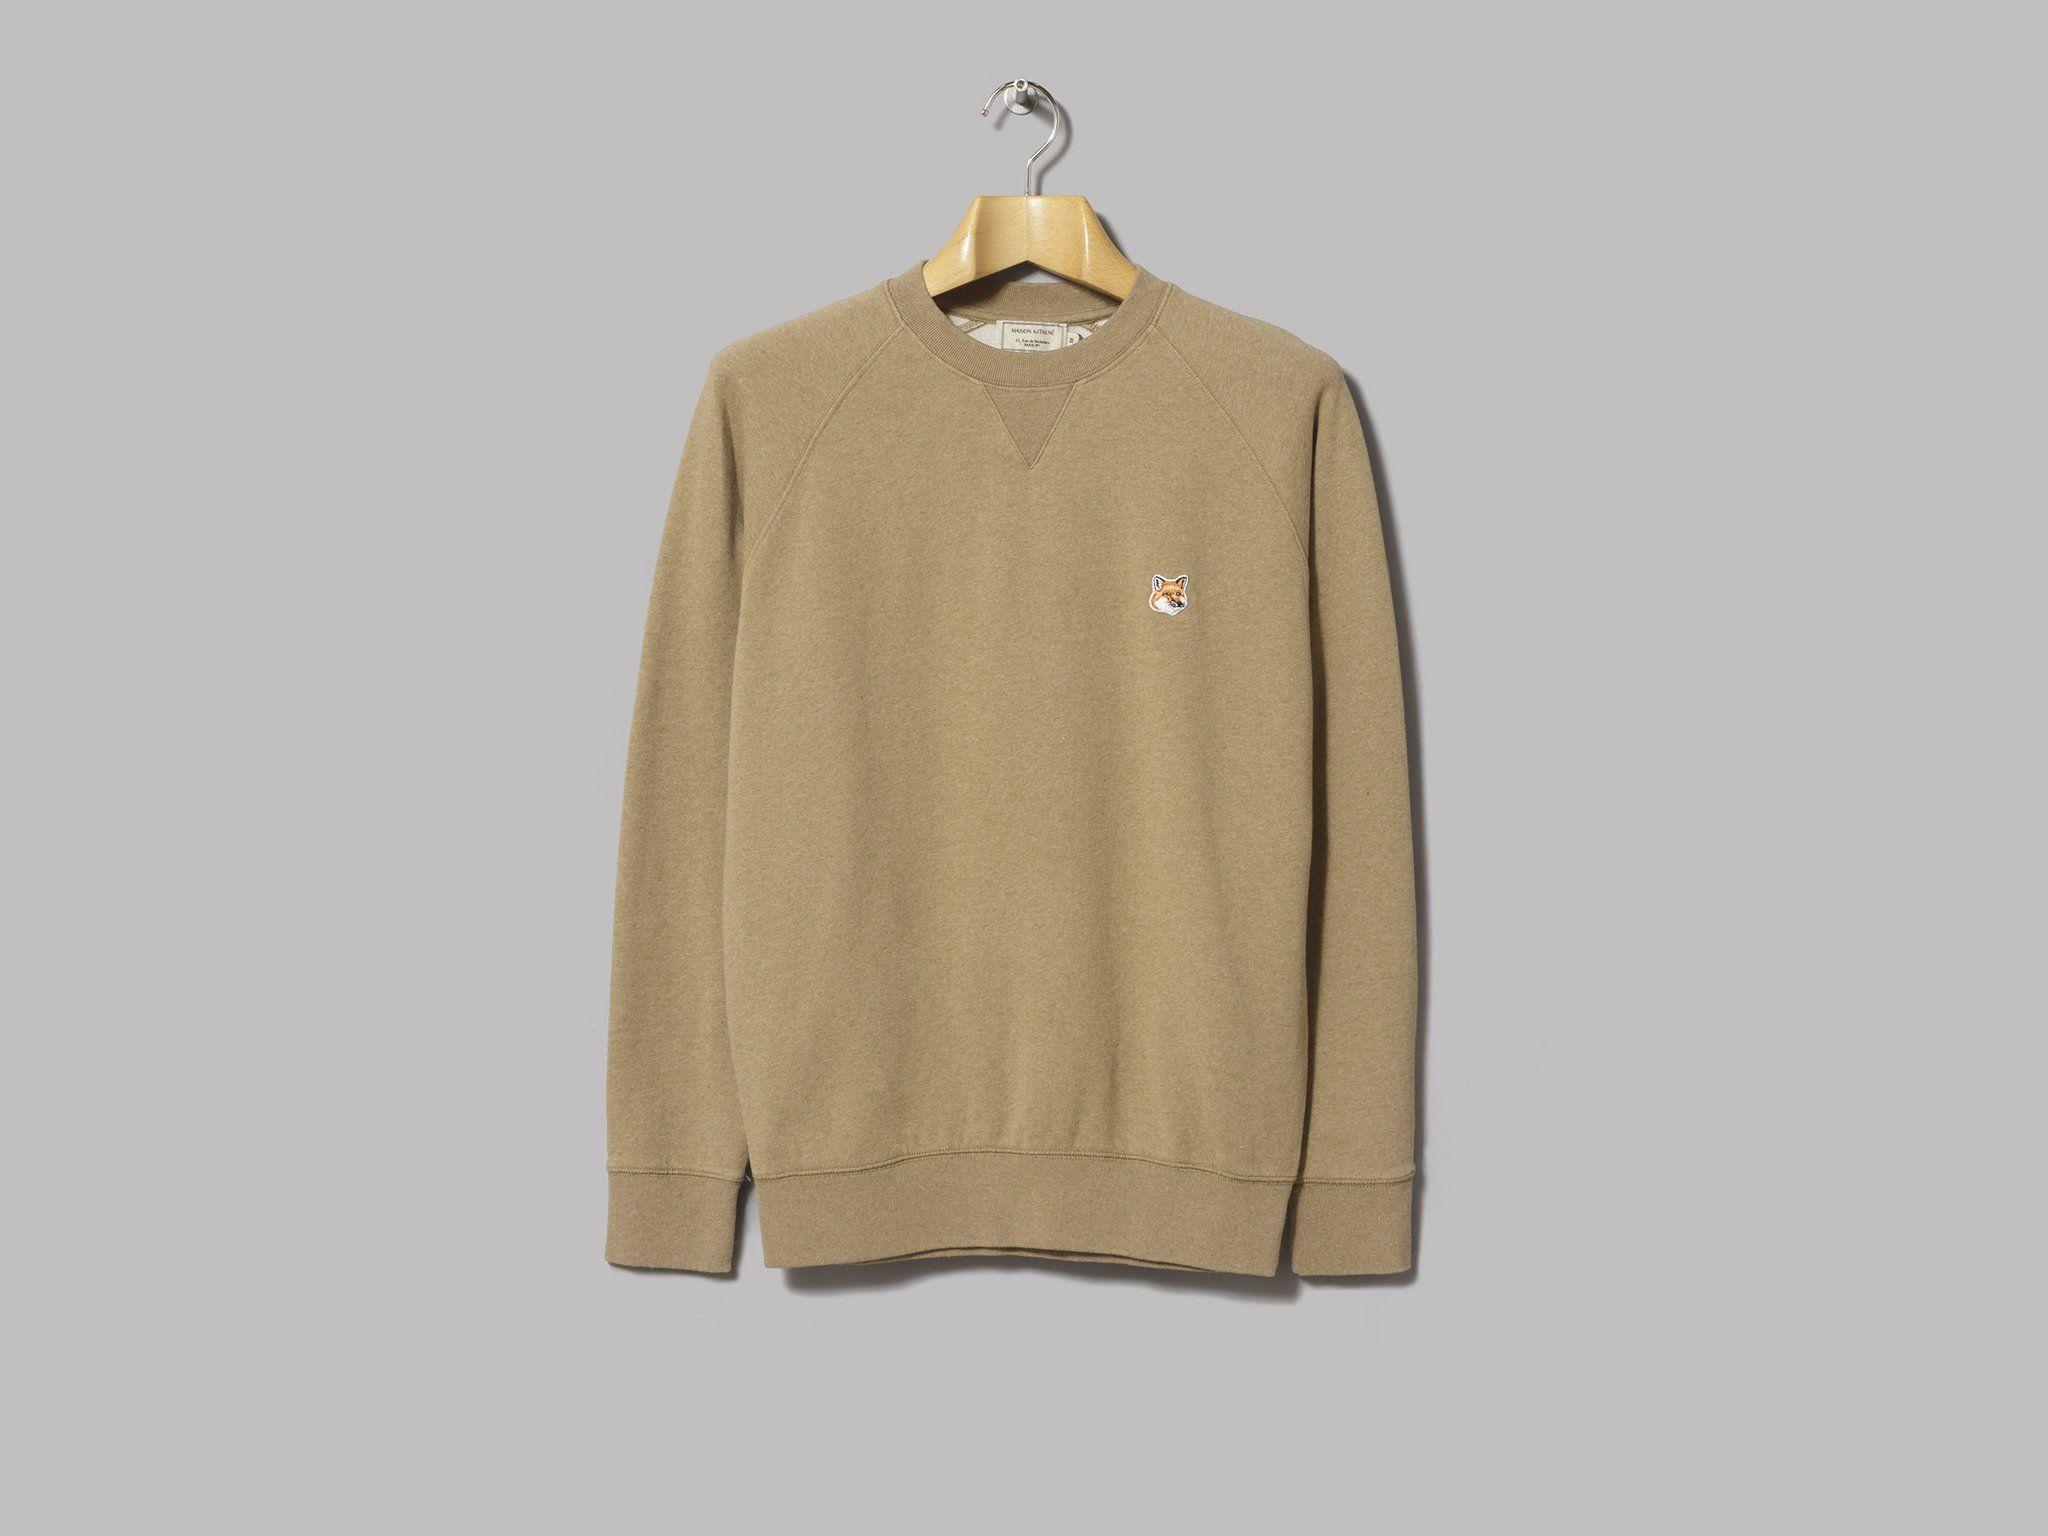 Maison Kitsune Fox Head Patch Sweatshirt Beige Melange Long Sleeve Tshirt Men Patch Sweatshirts Mens Tops [ 1536 x 2048 Pixel ]